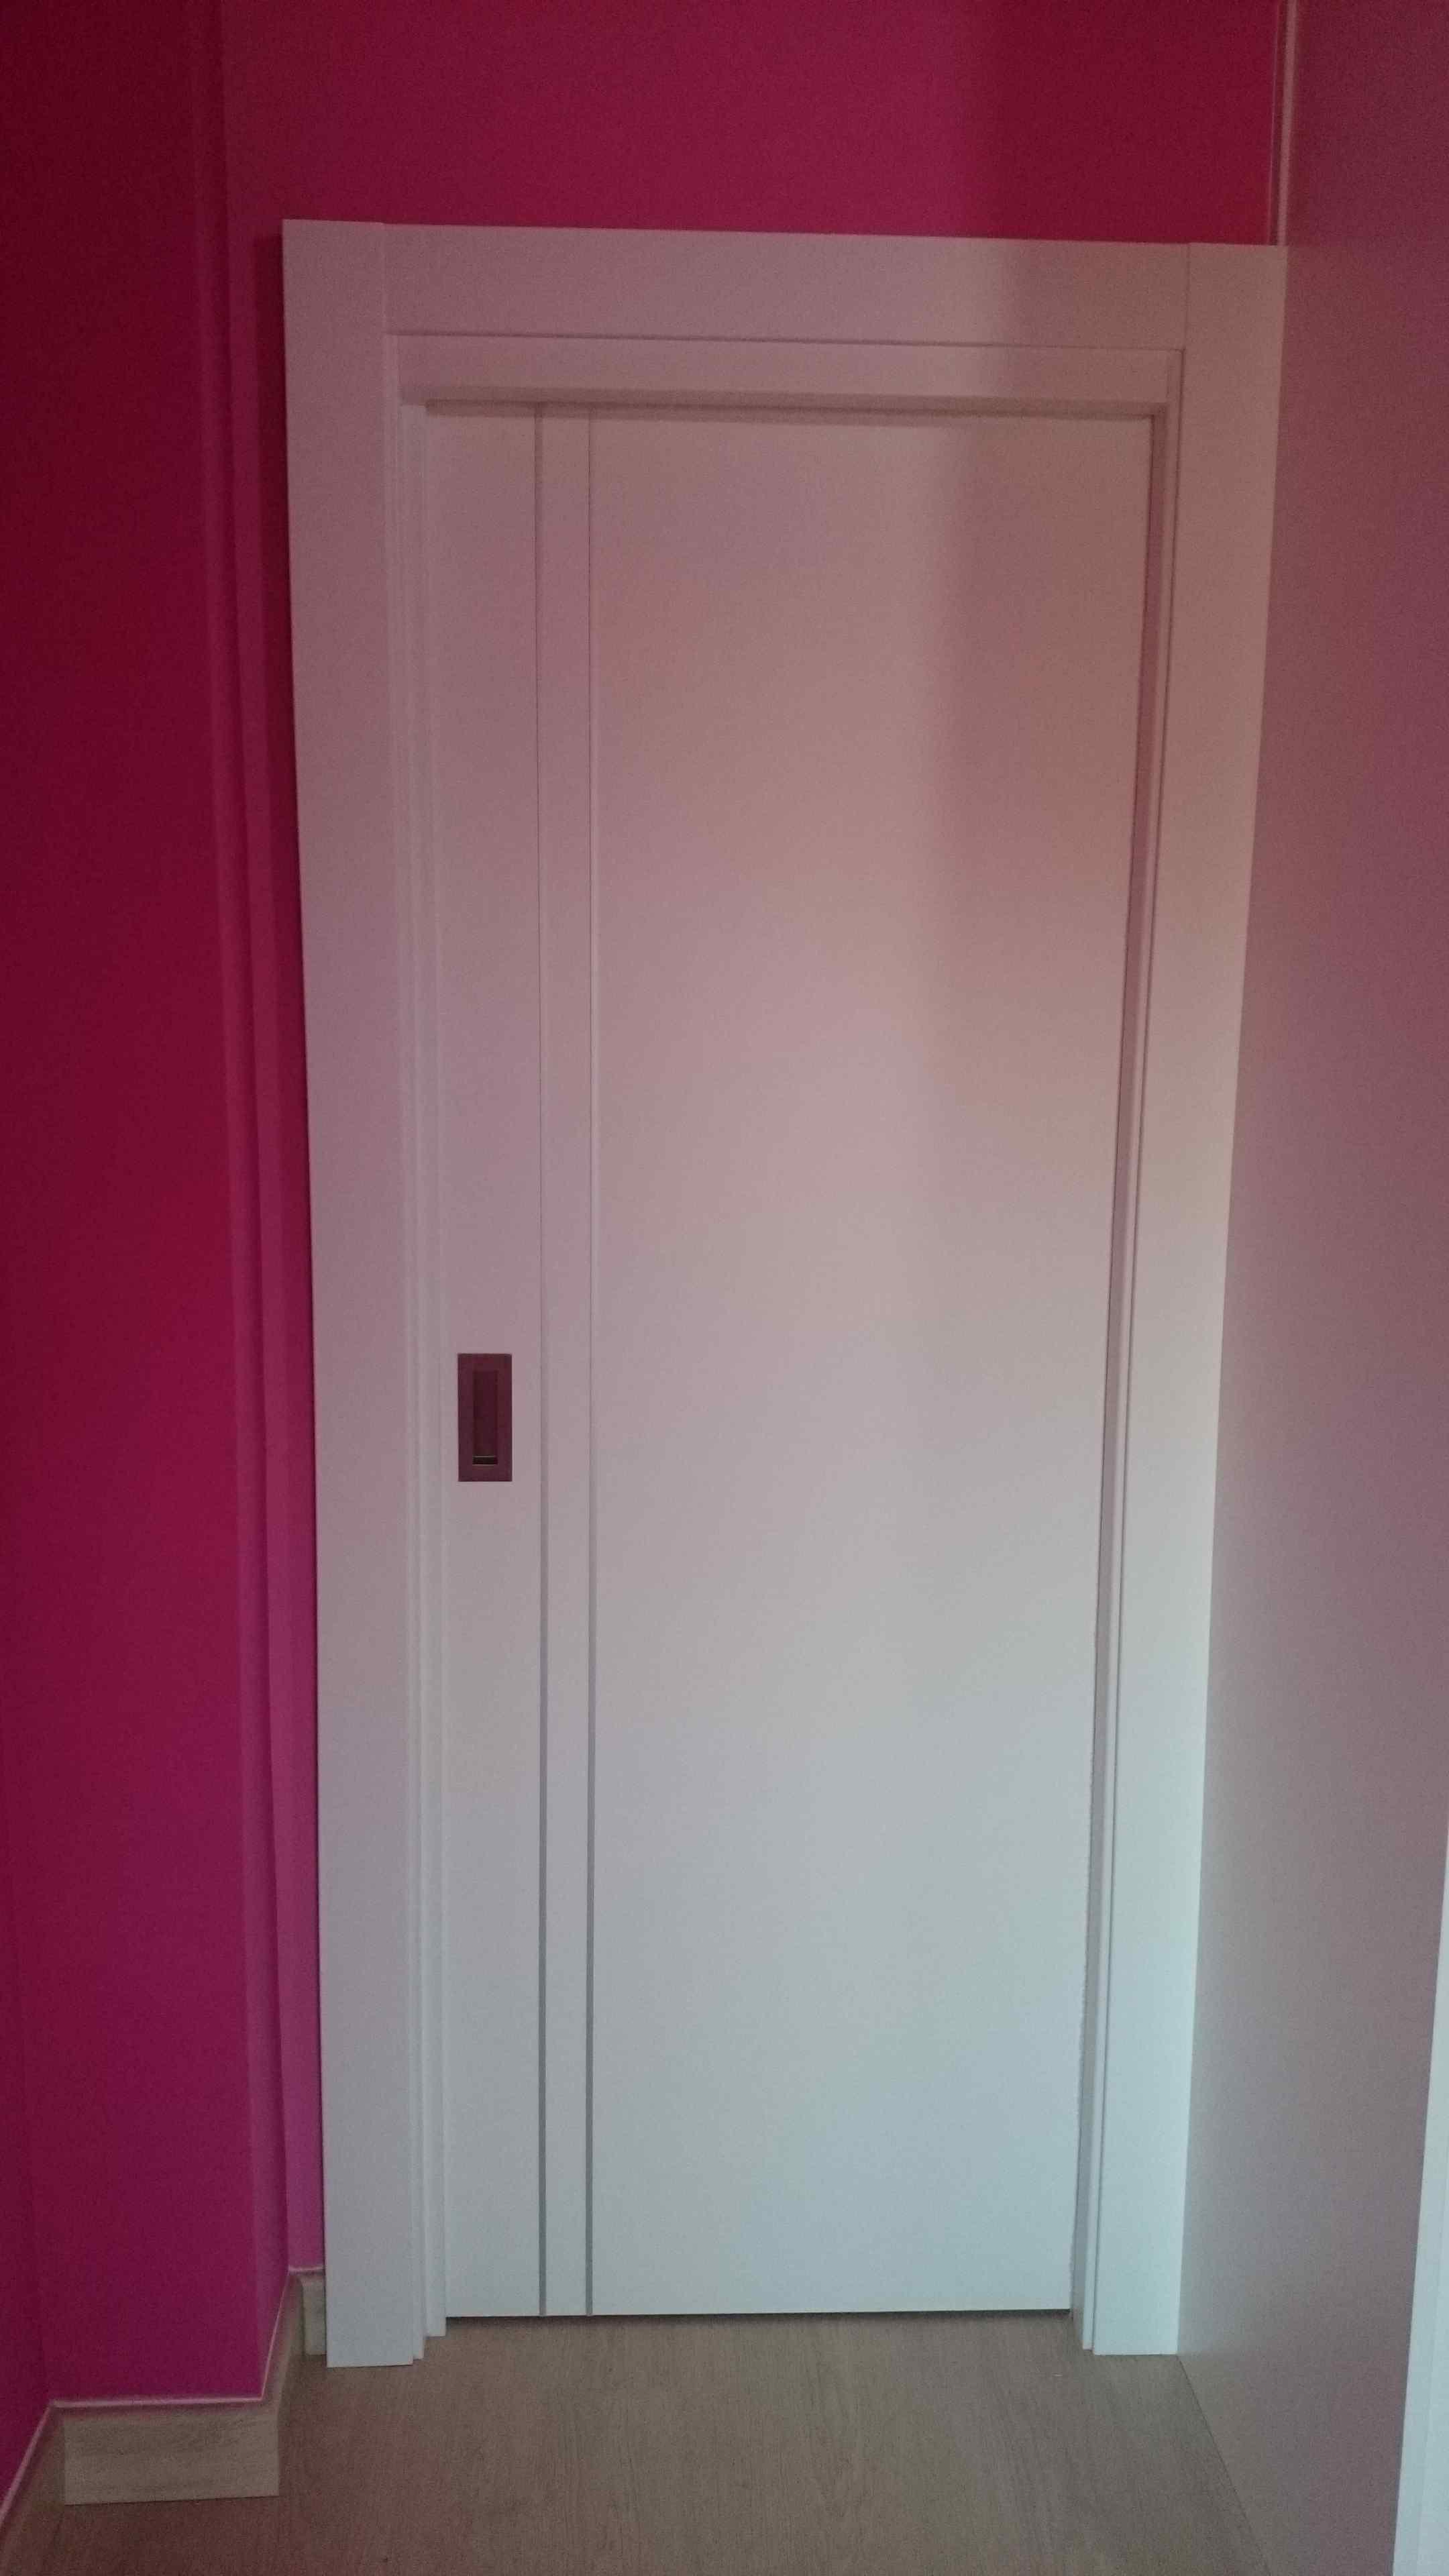 Carpintería Familia Murcia » Puertas lacadas blancas con dos líneas ...